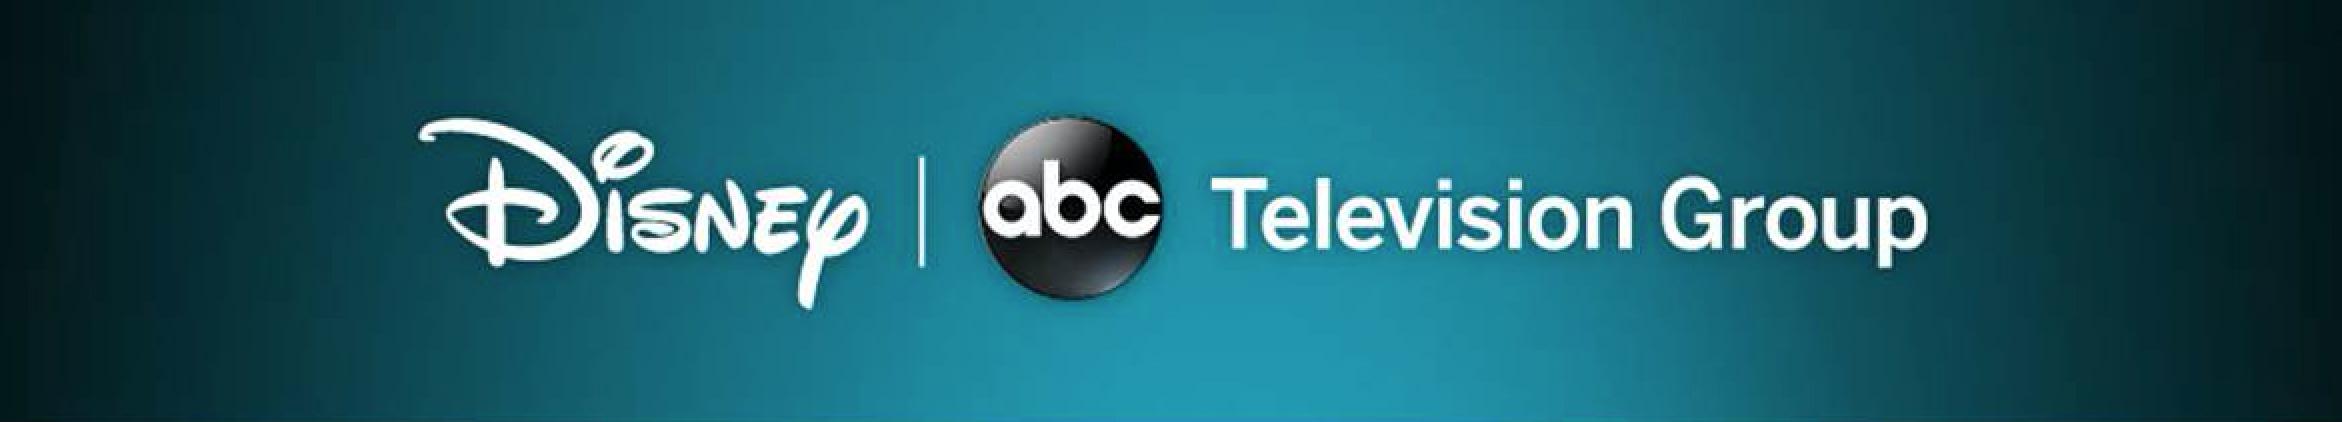 disney abc television group banner